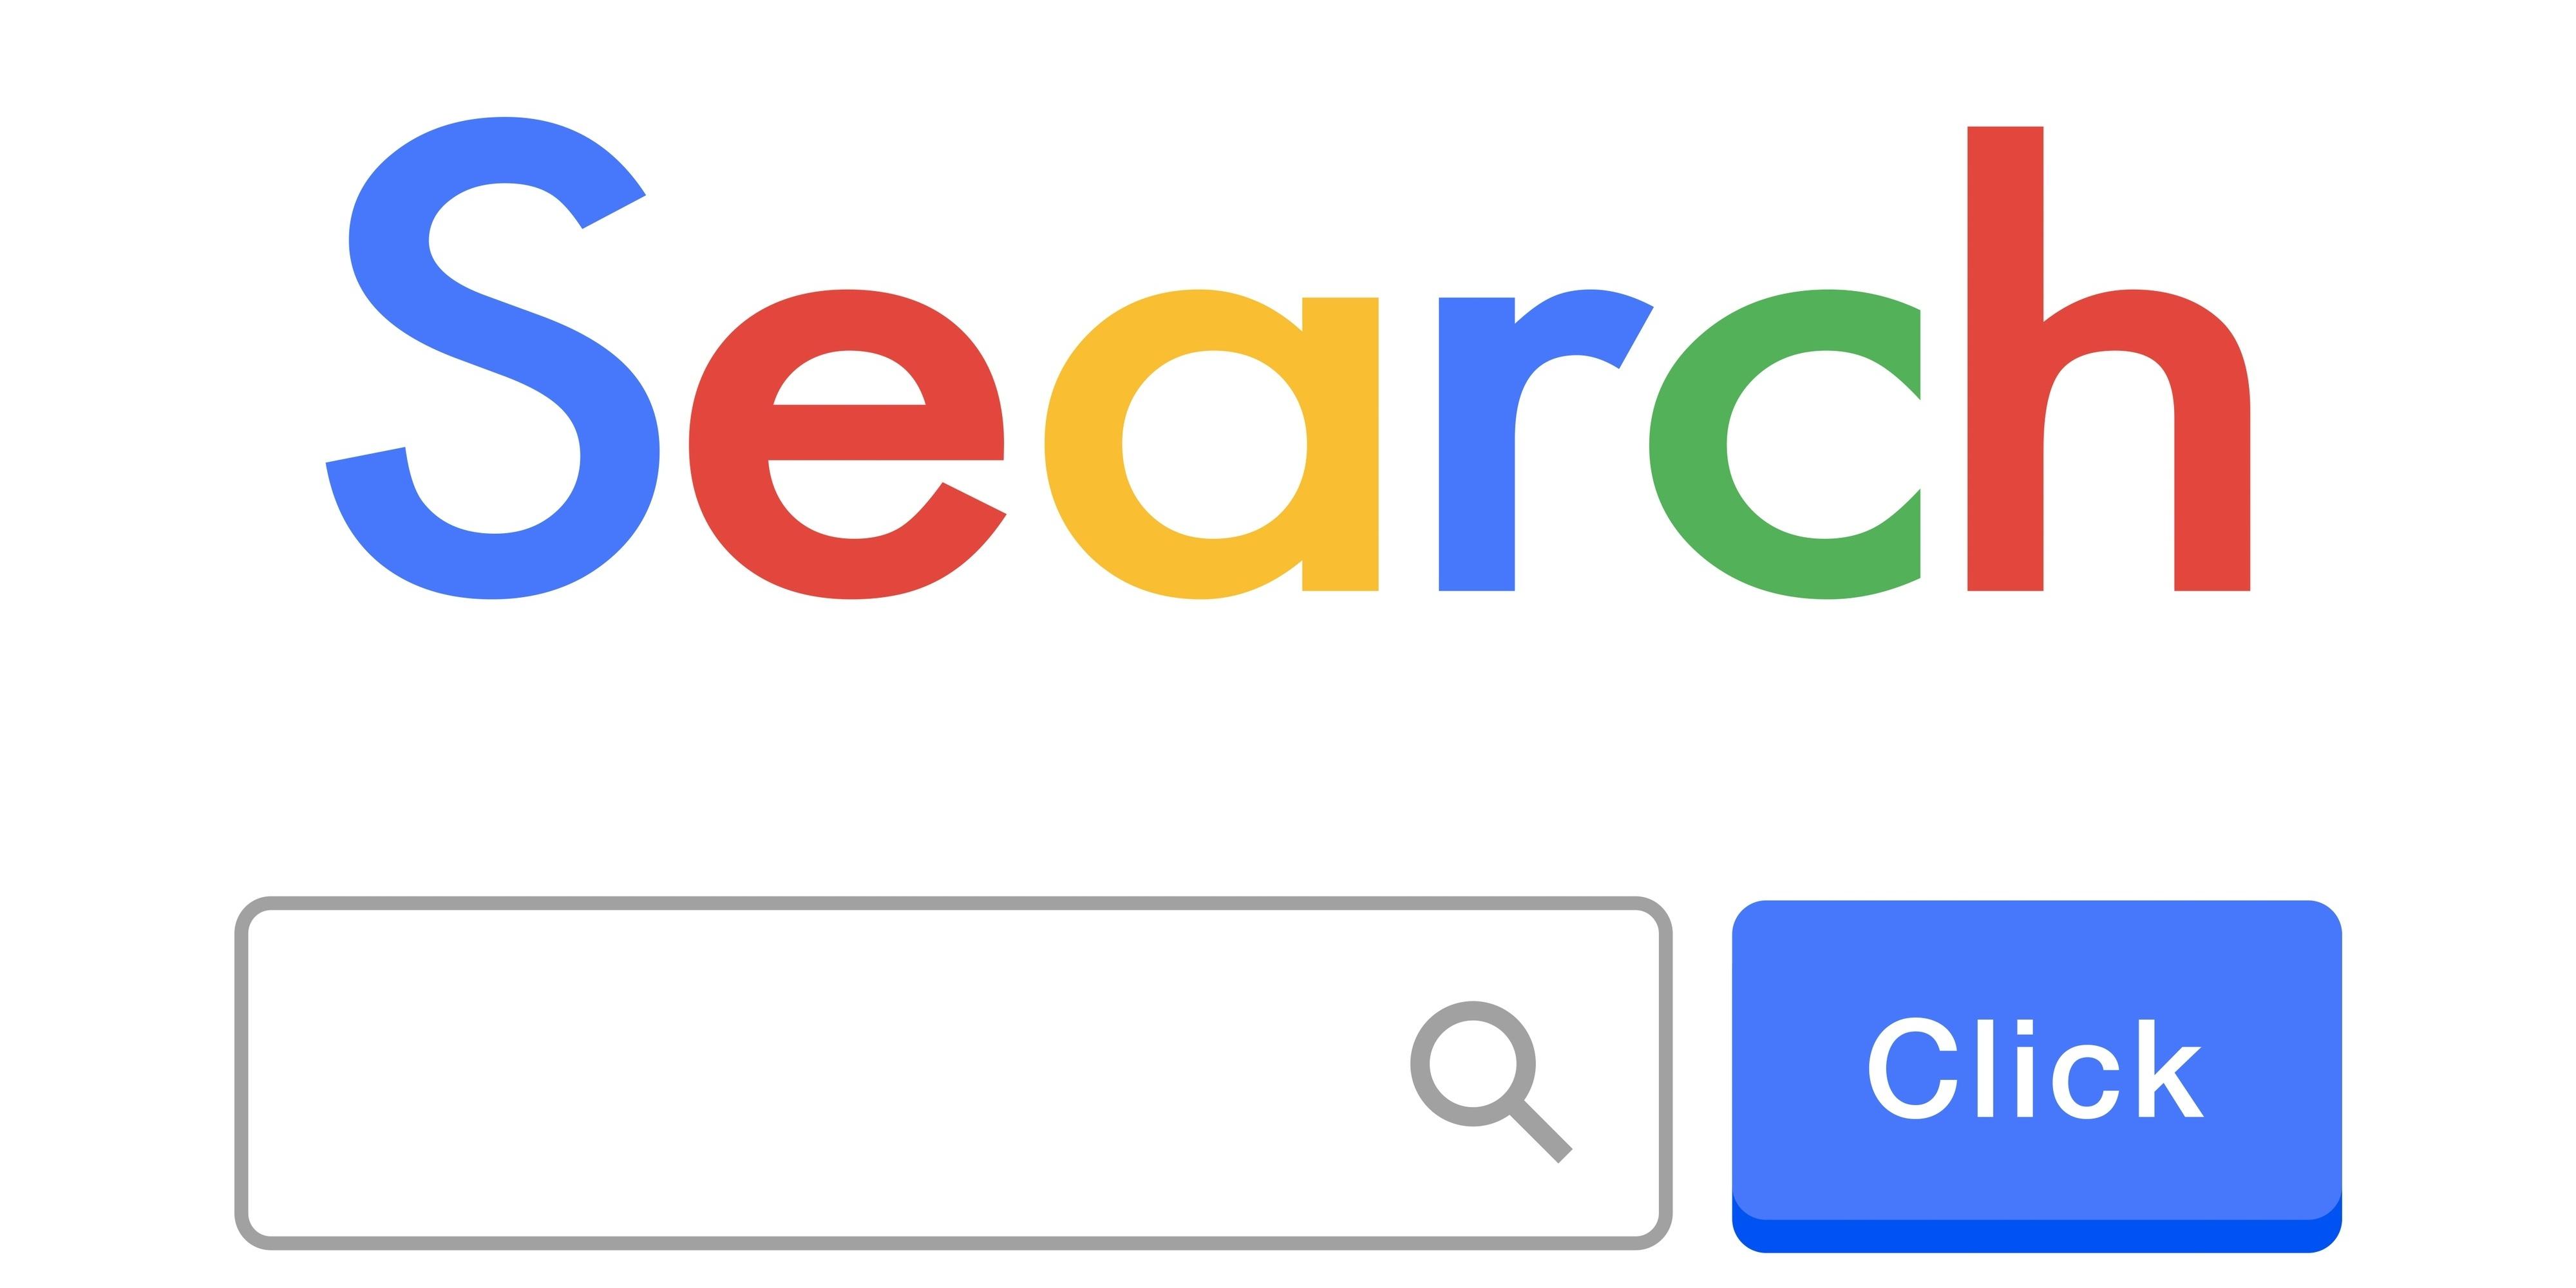 SEO_search_google_engine-493345-edited